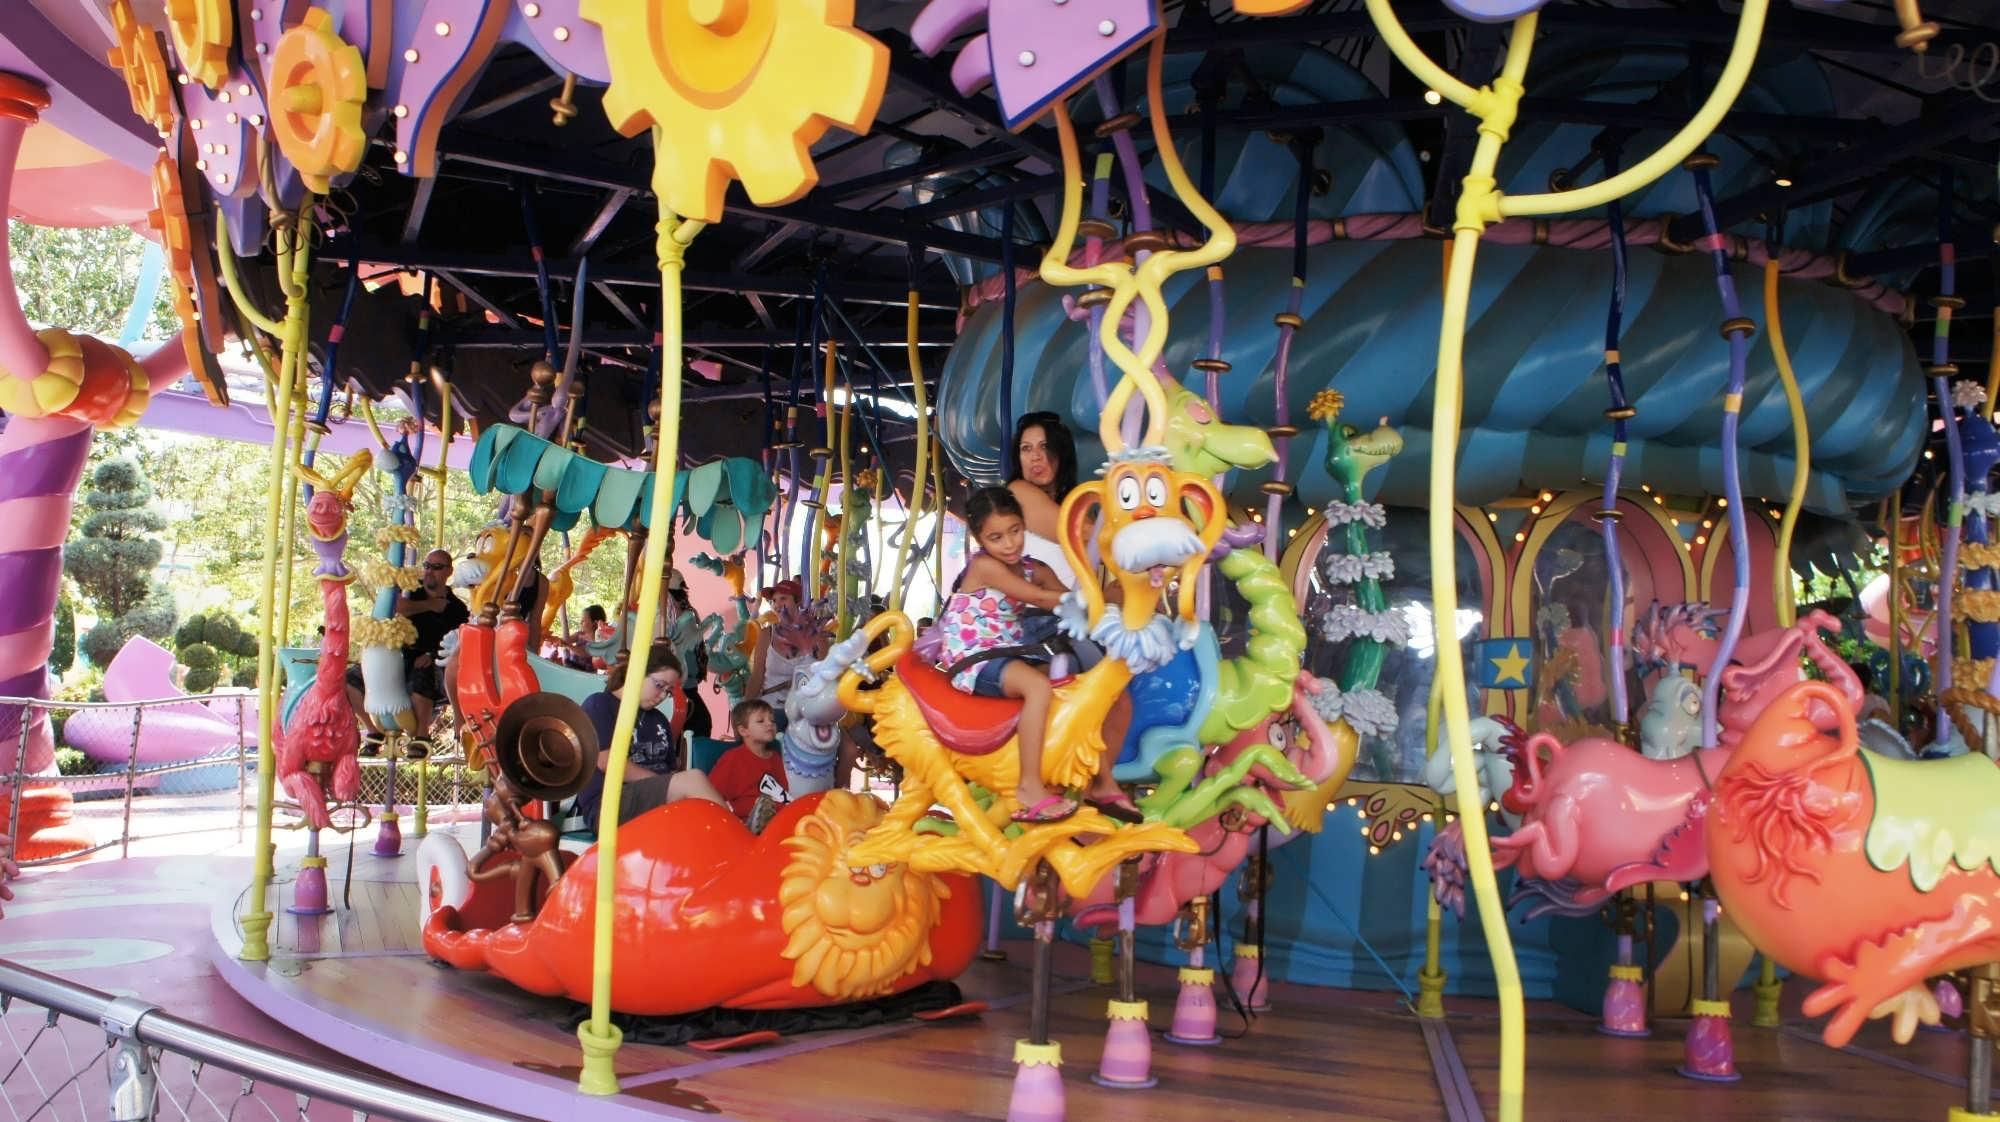 Caro-Seuss-el at Universal's Islands of Adventure